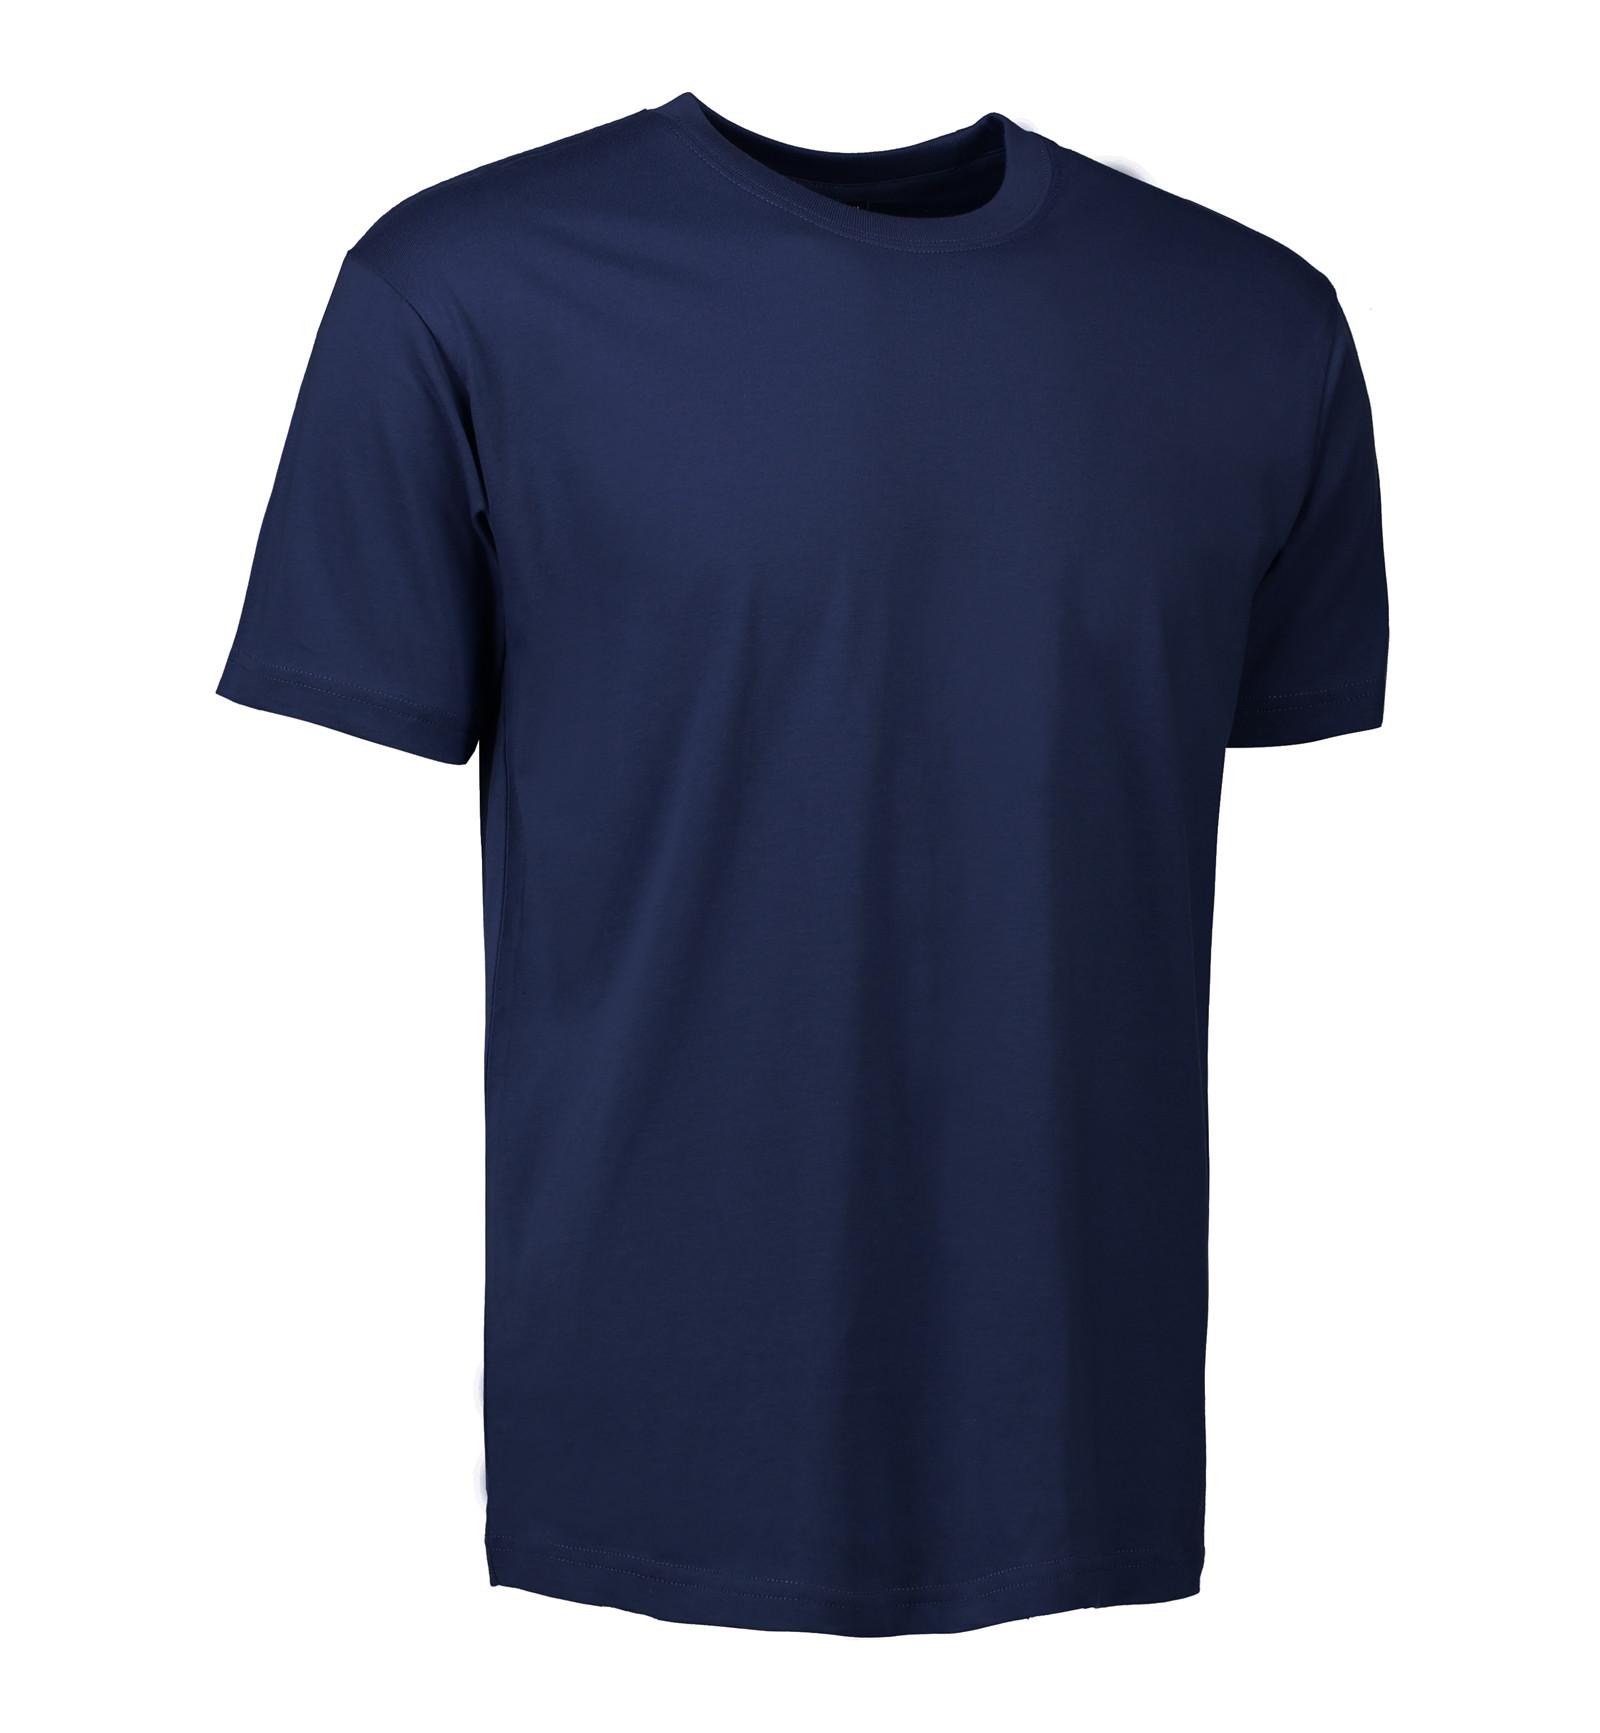 TILBUD - T-shirt, 8504 - Marine